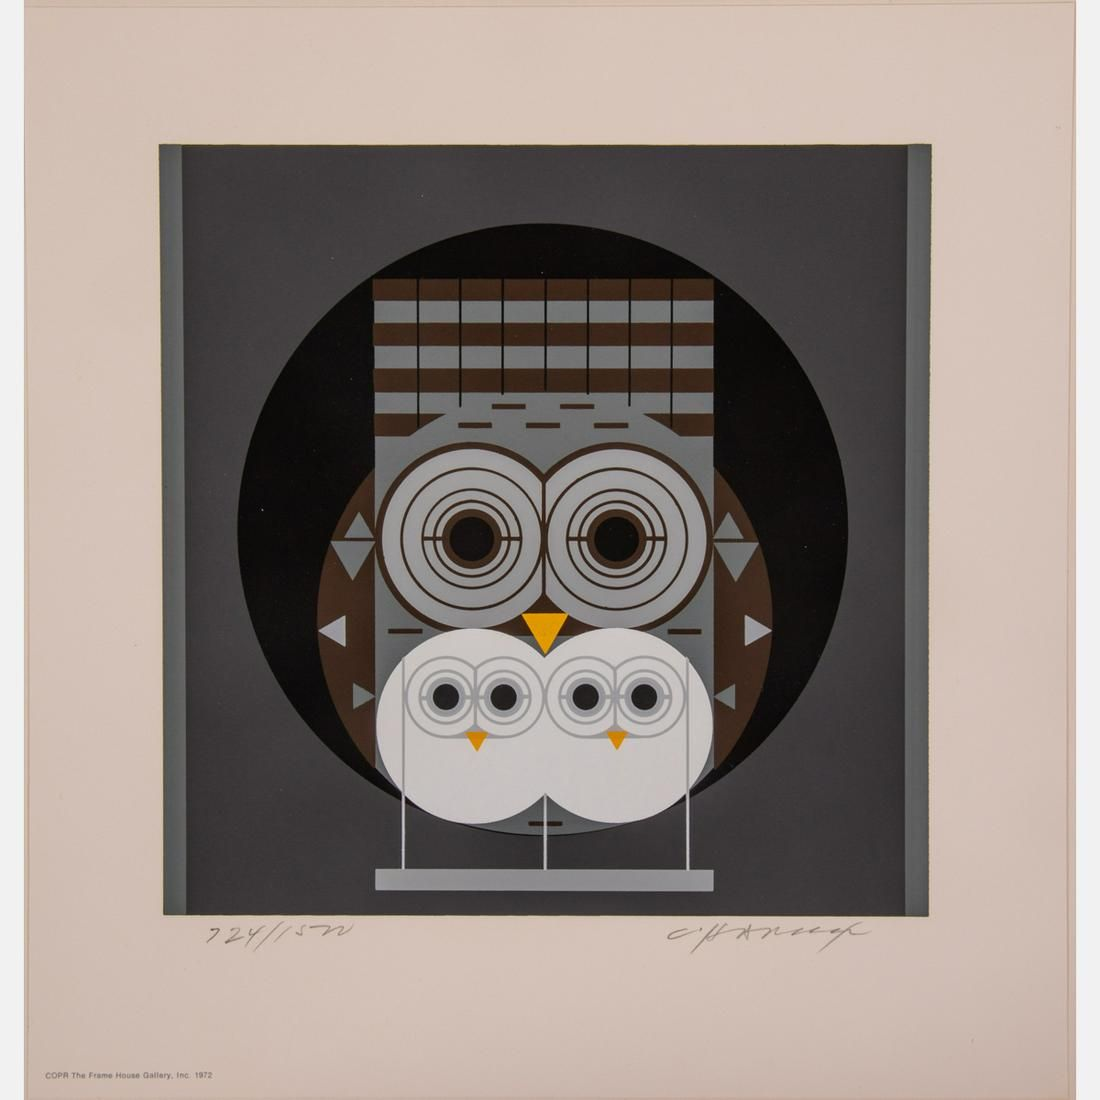 Charles Harper (American, 1922-2007) Family Owlbum,